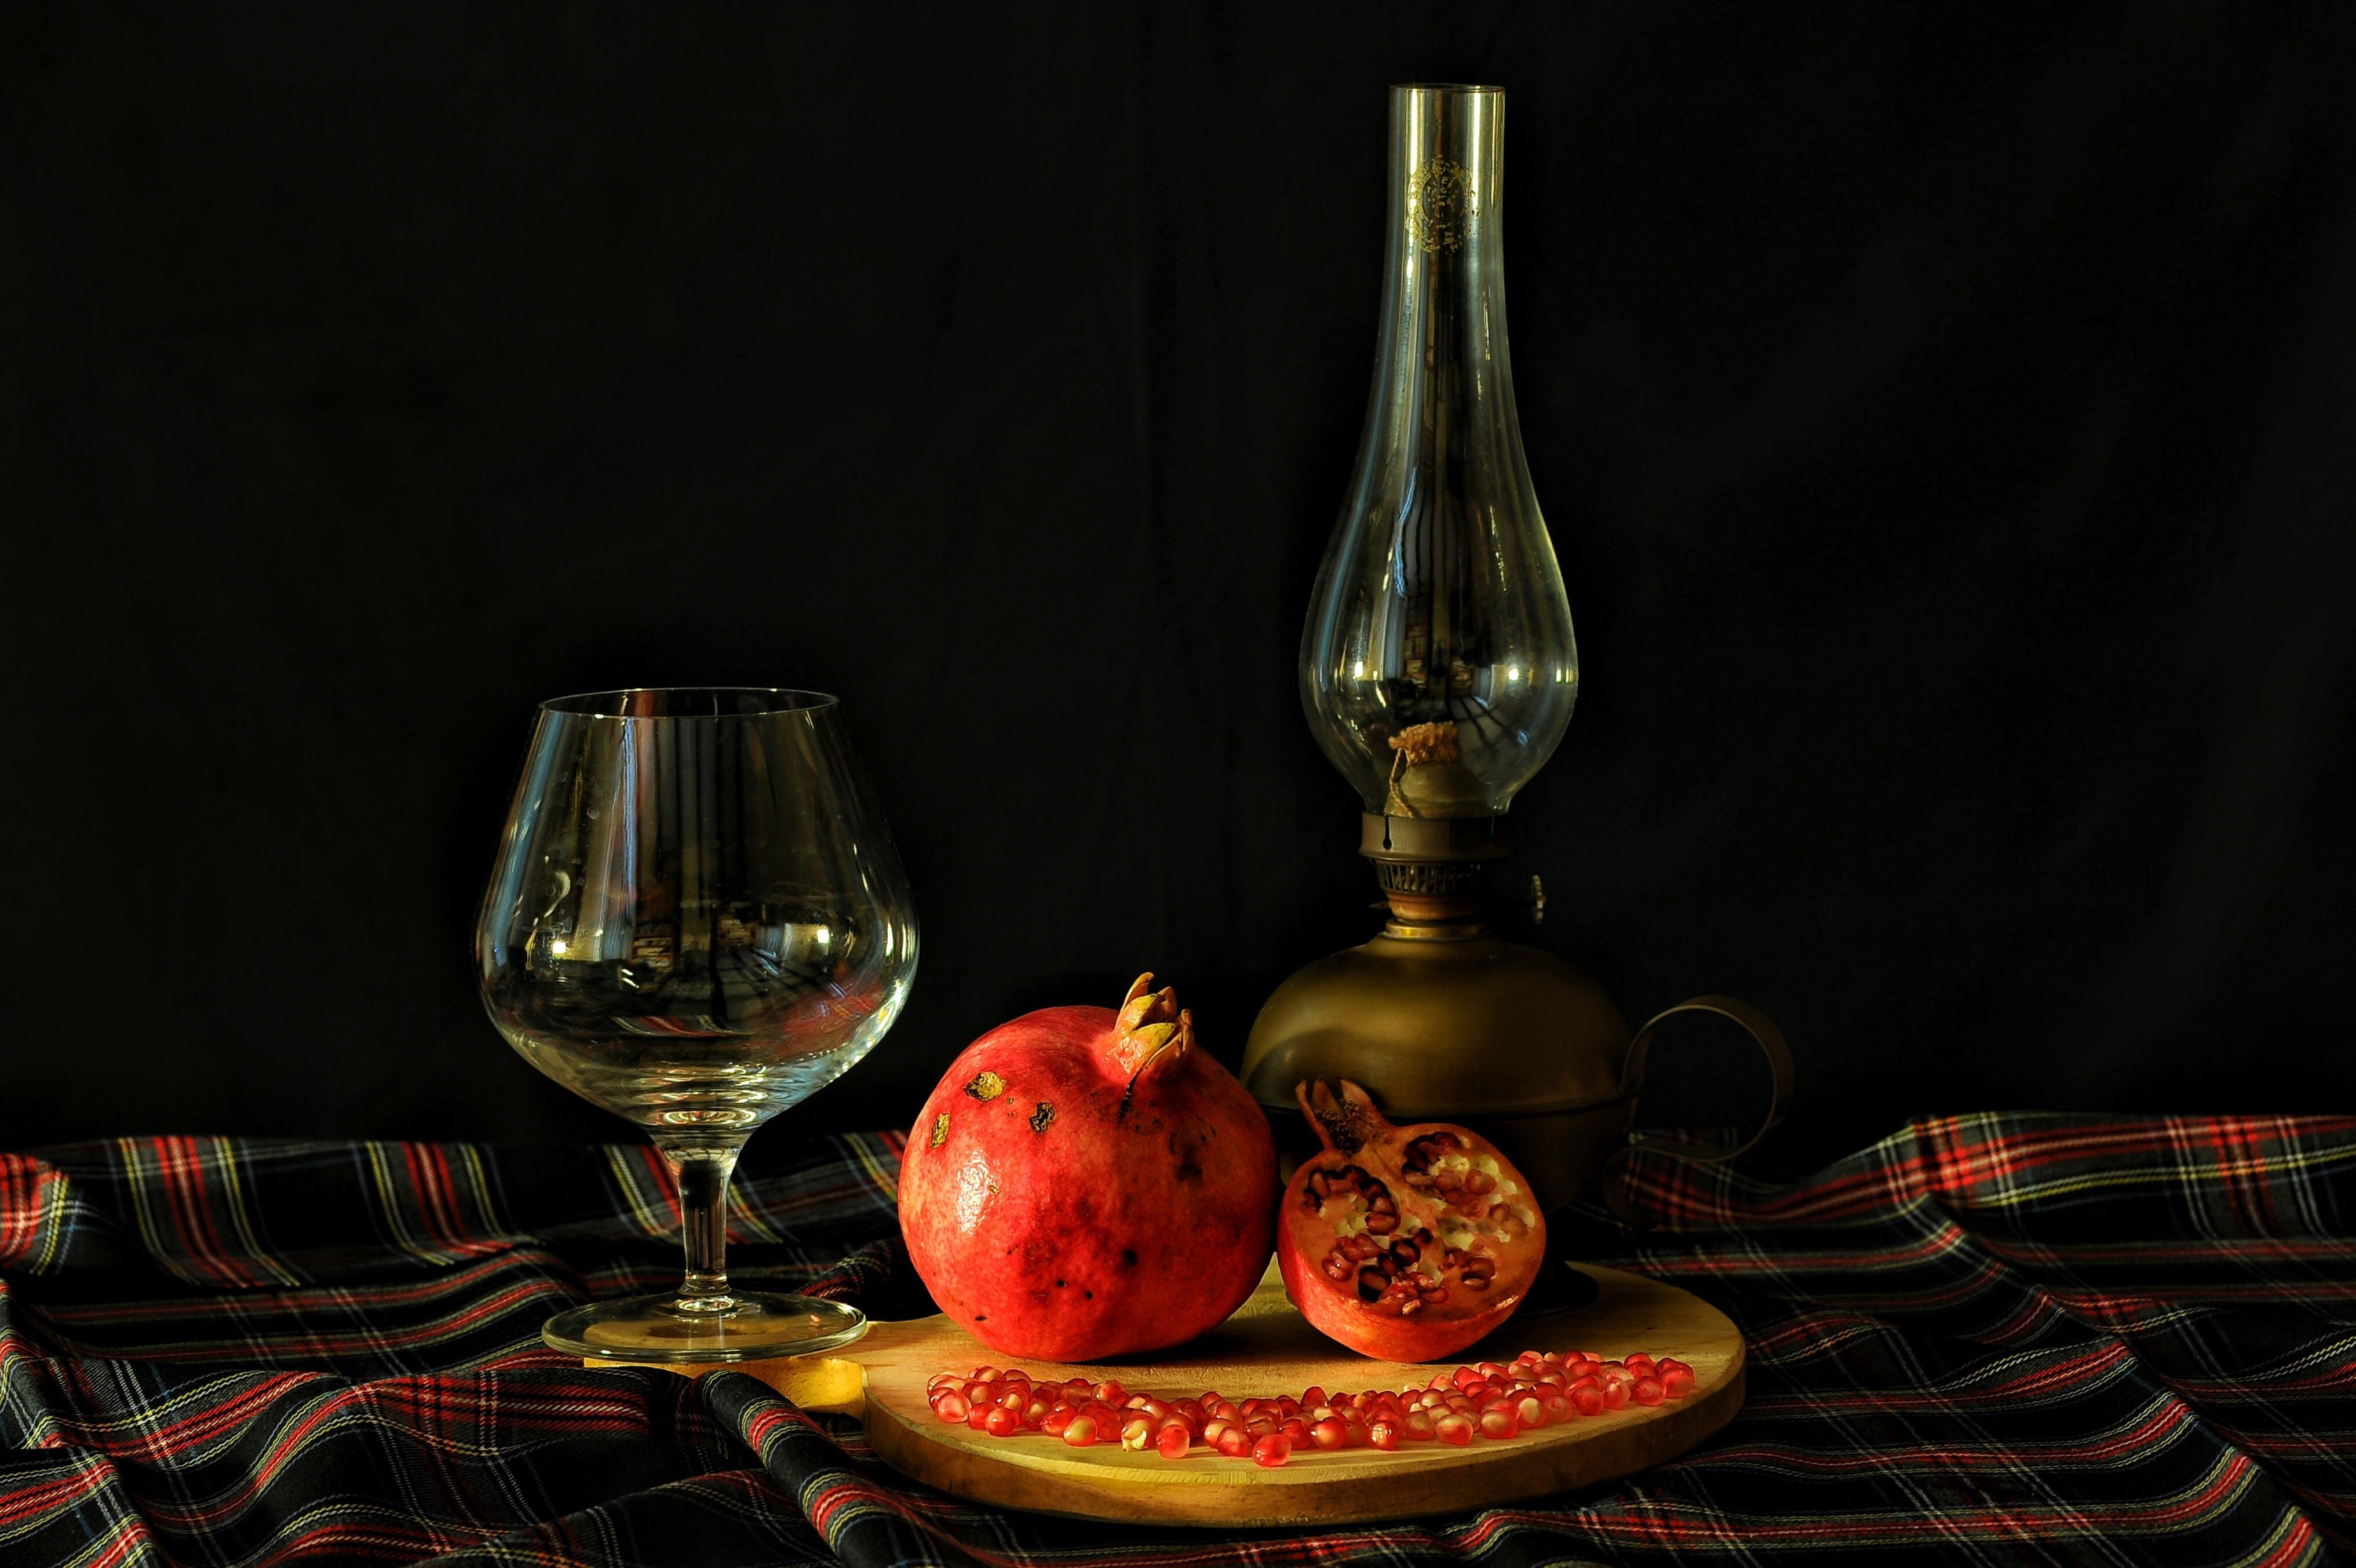 Wine Glass and Pomegranate